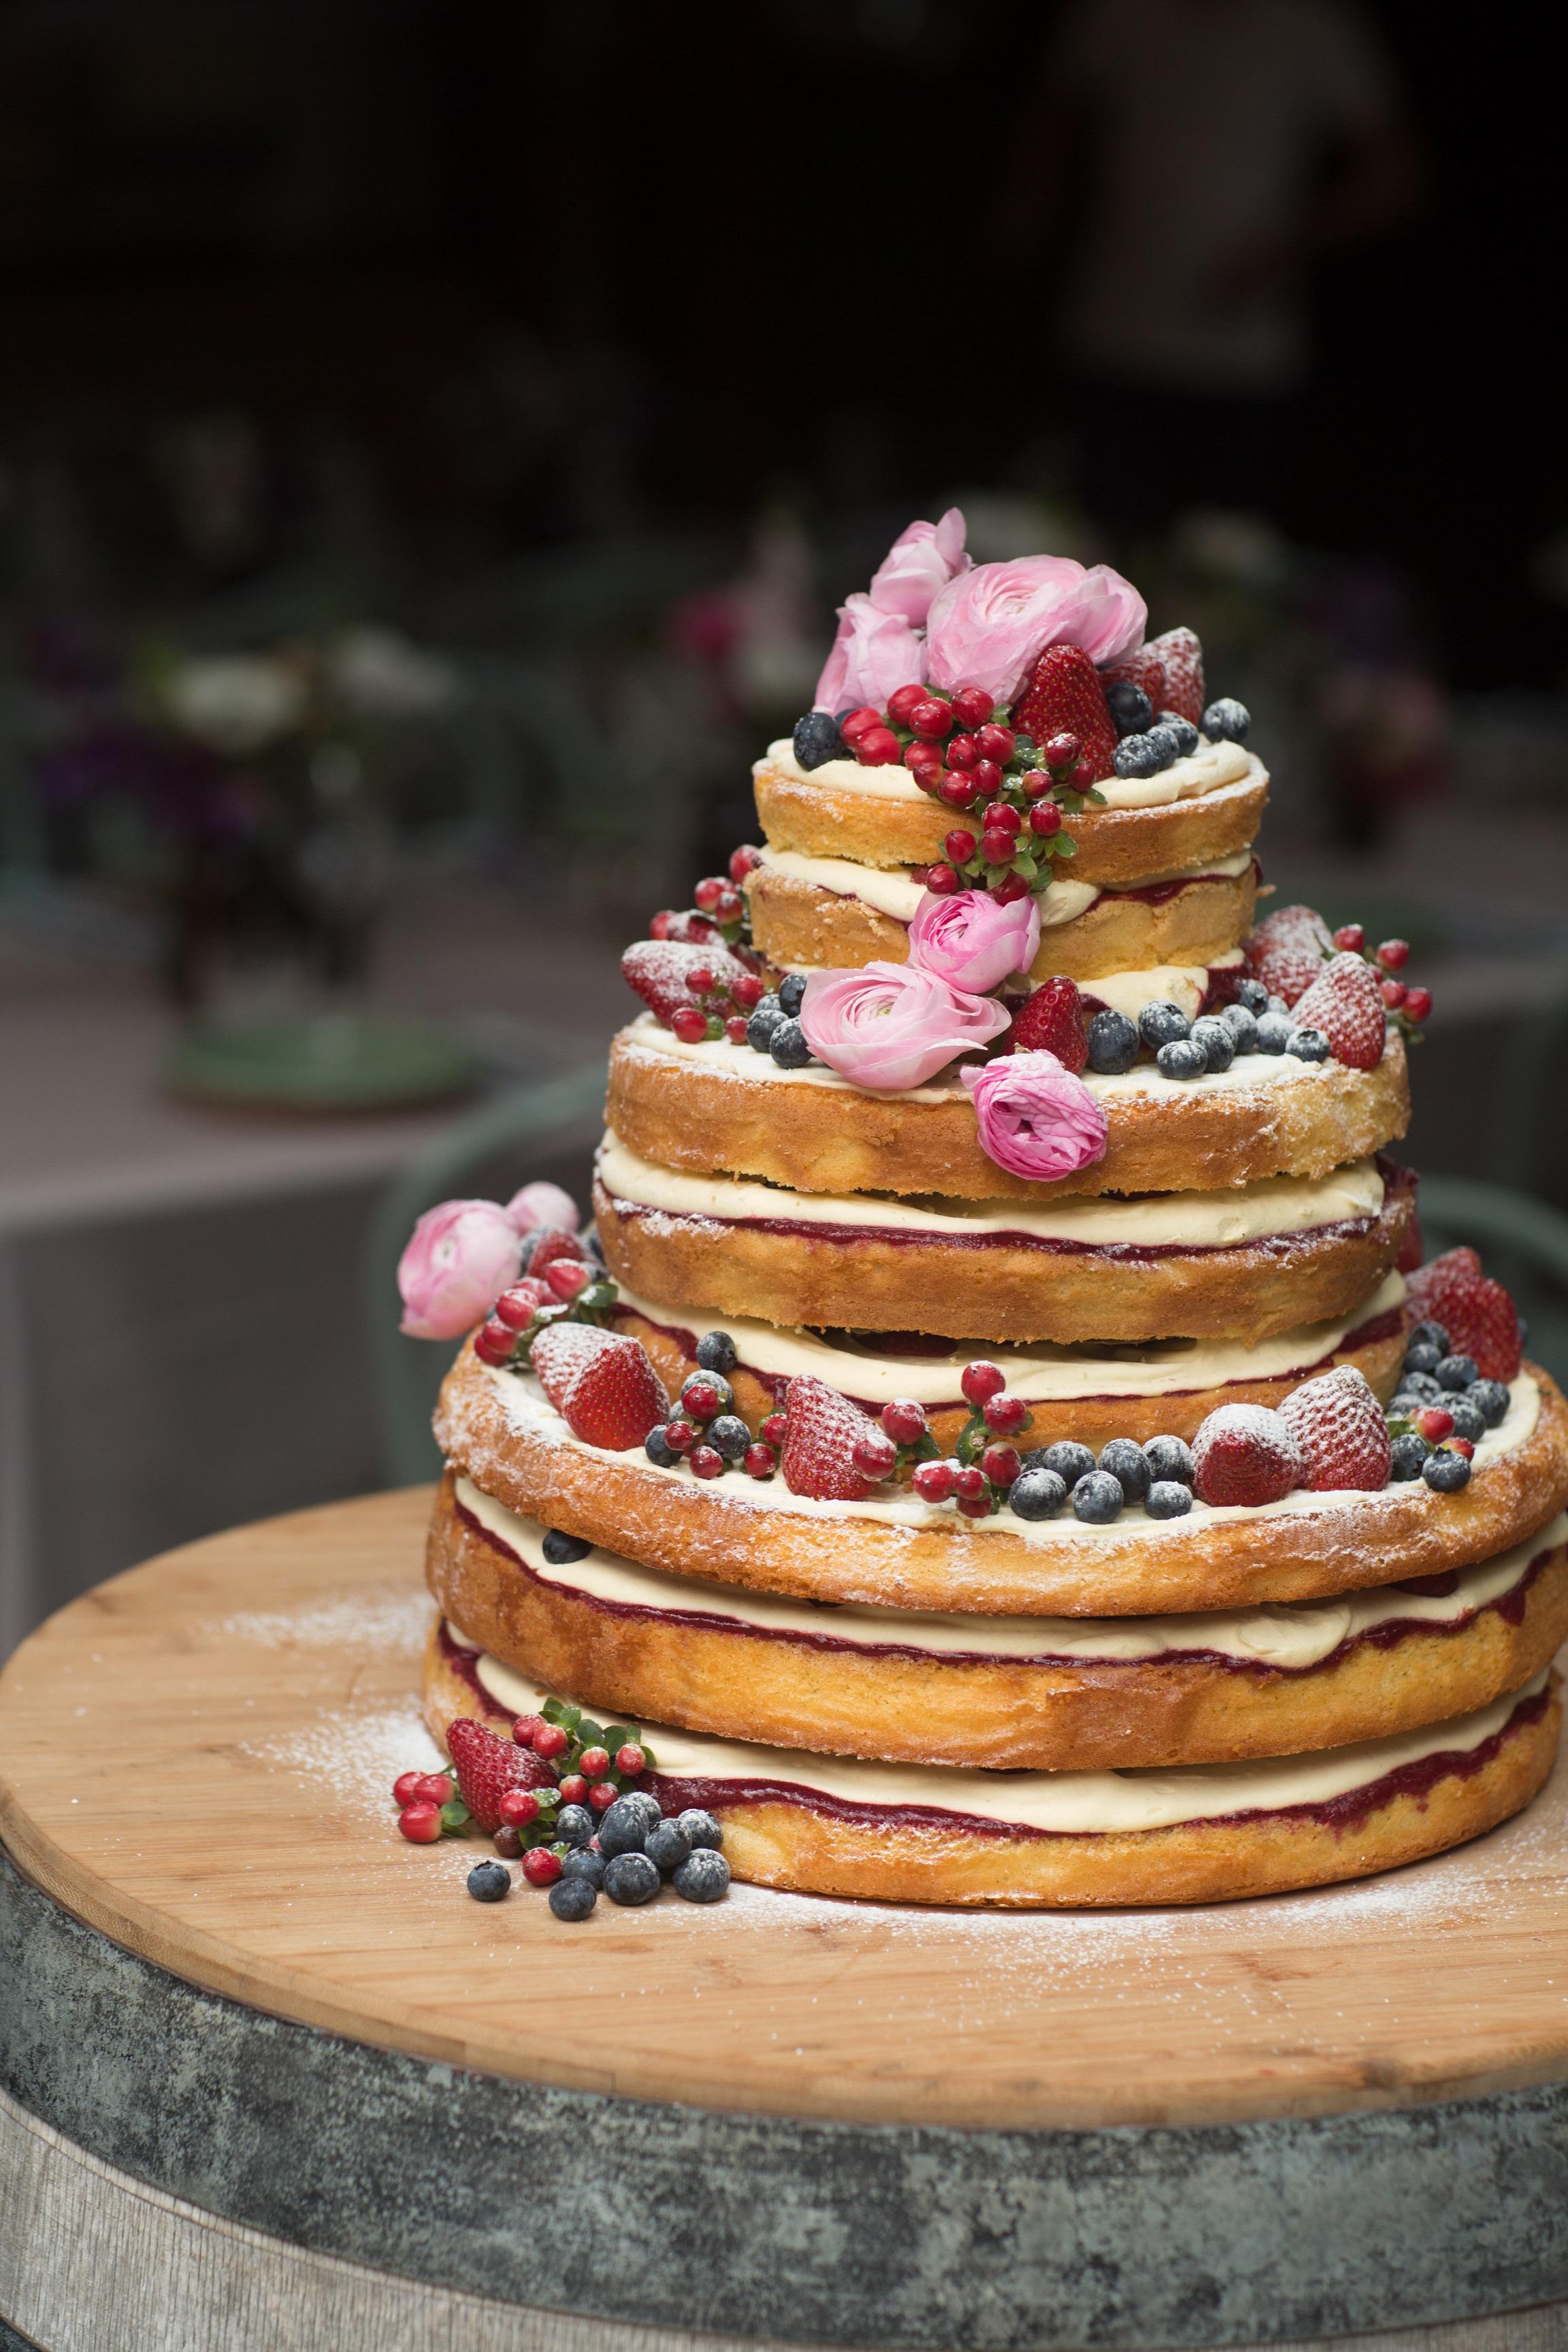 wedding cake 28-8-1-1-2